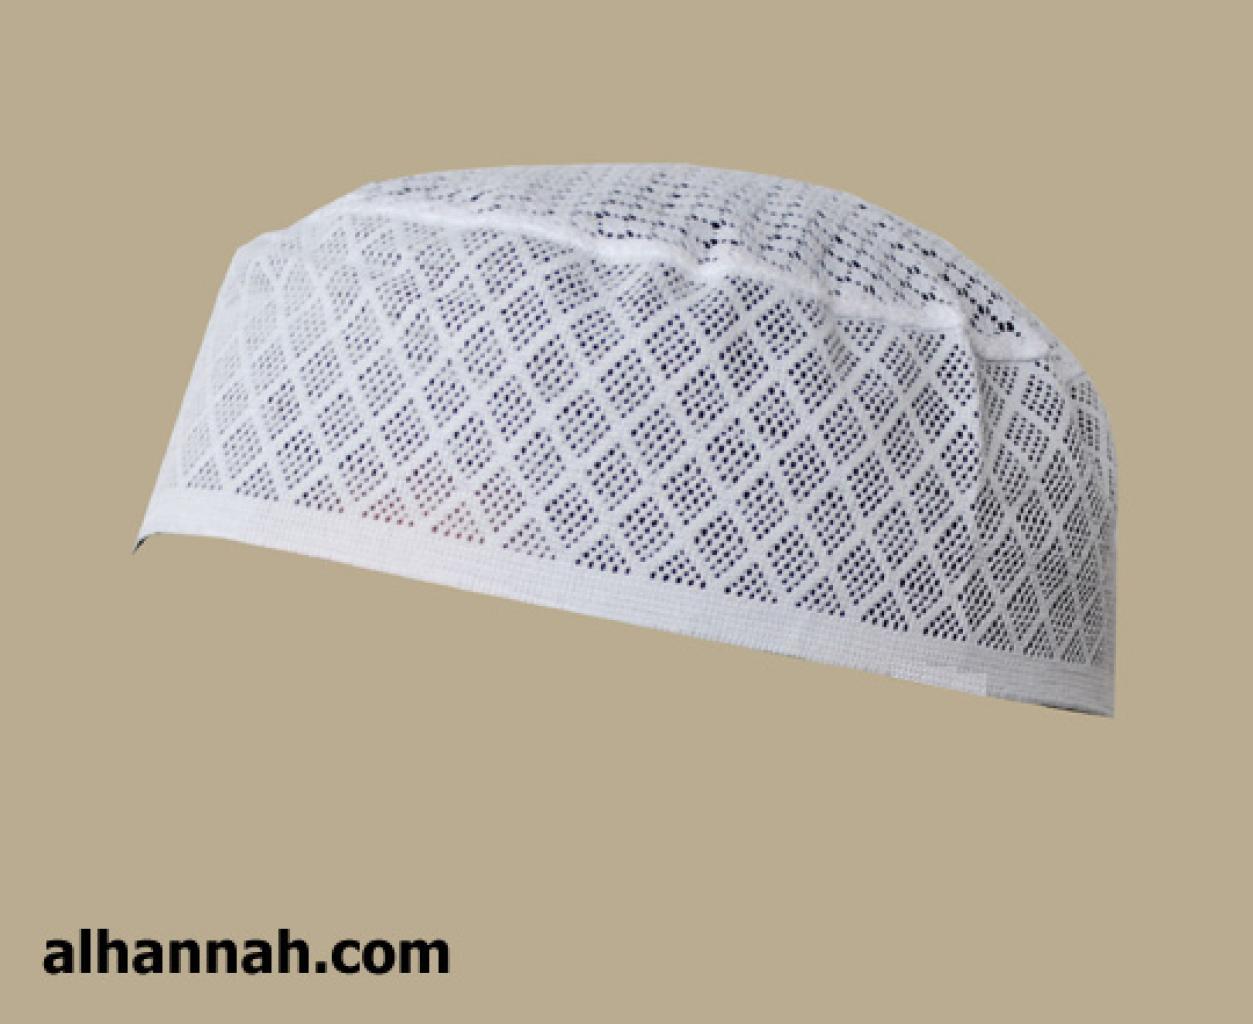 Algodón de diamante para hombre Kufi de algodón me567 - Alhannah ...